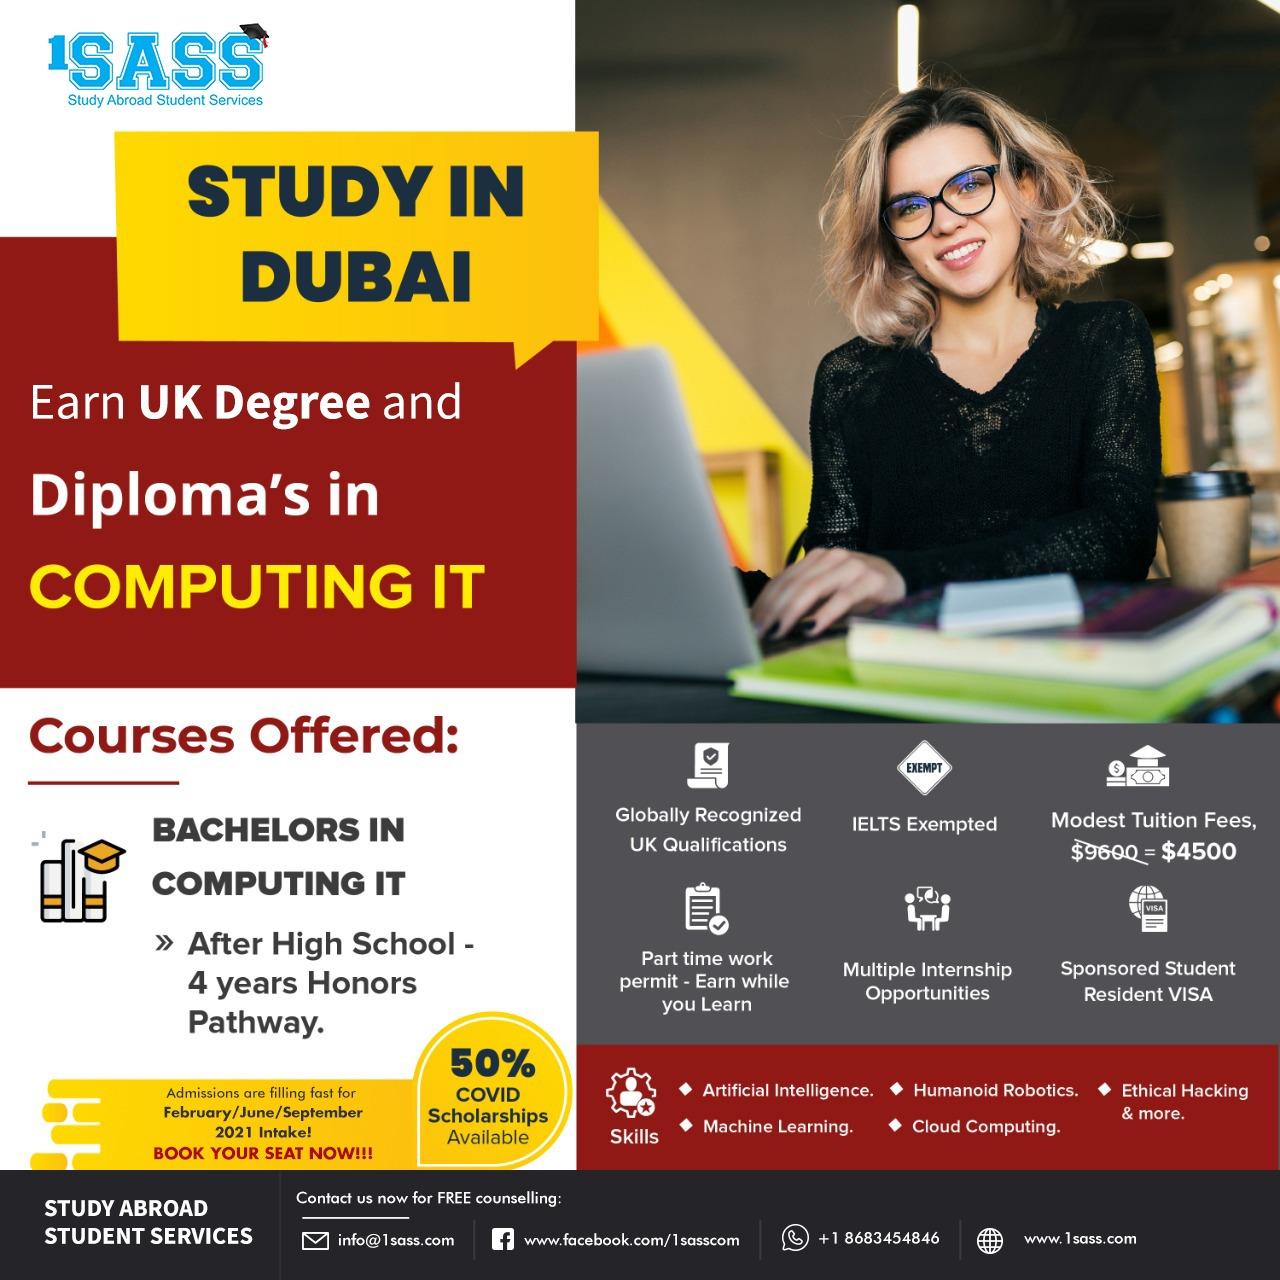 Study in Dubai - Computing IT